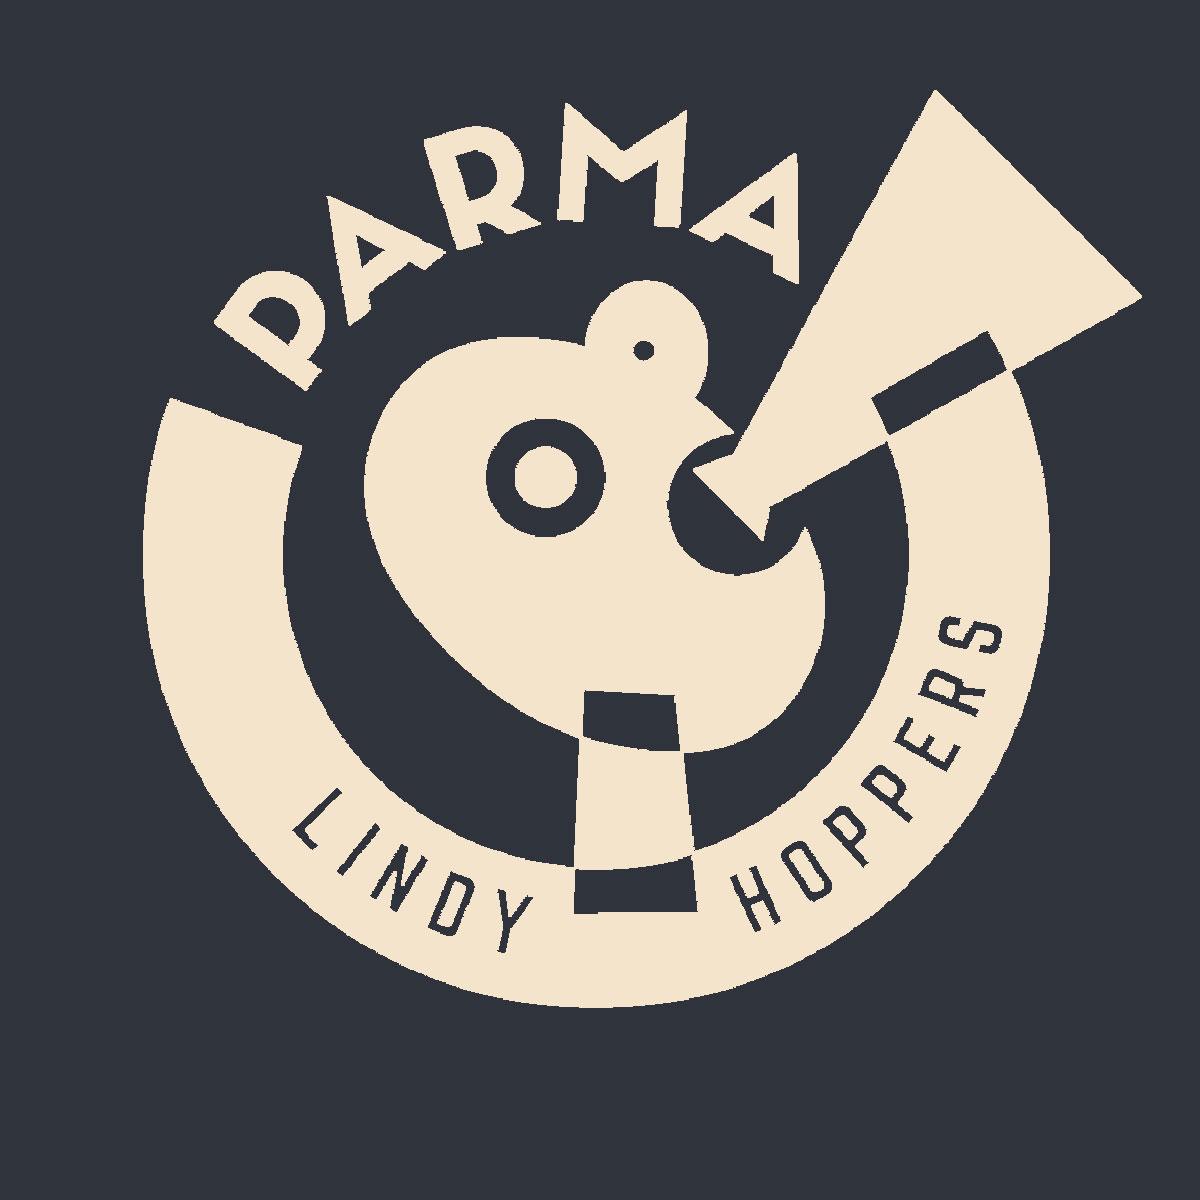 Parma Lindy Hoppers